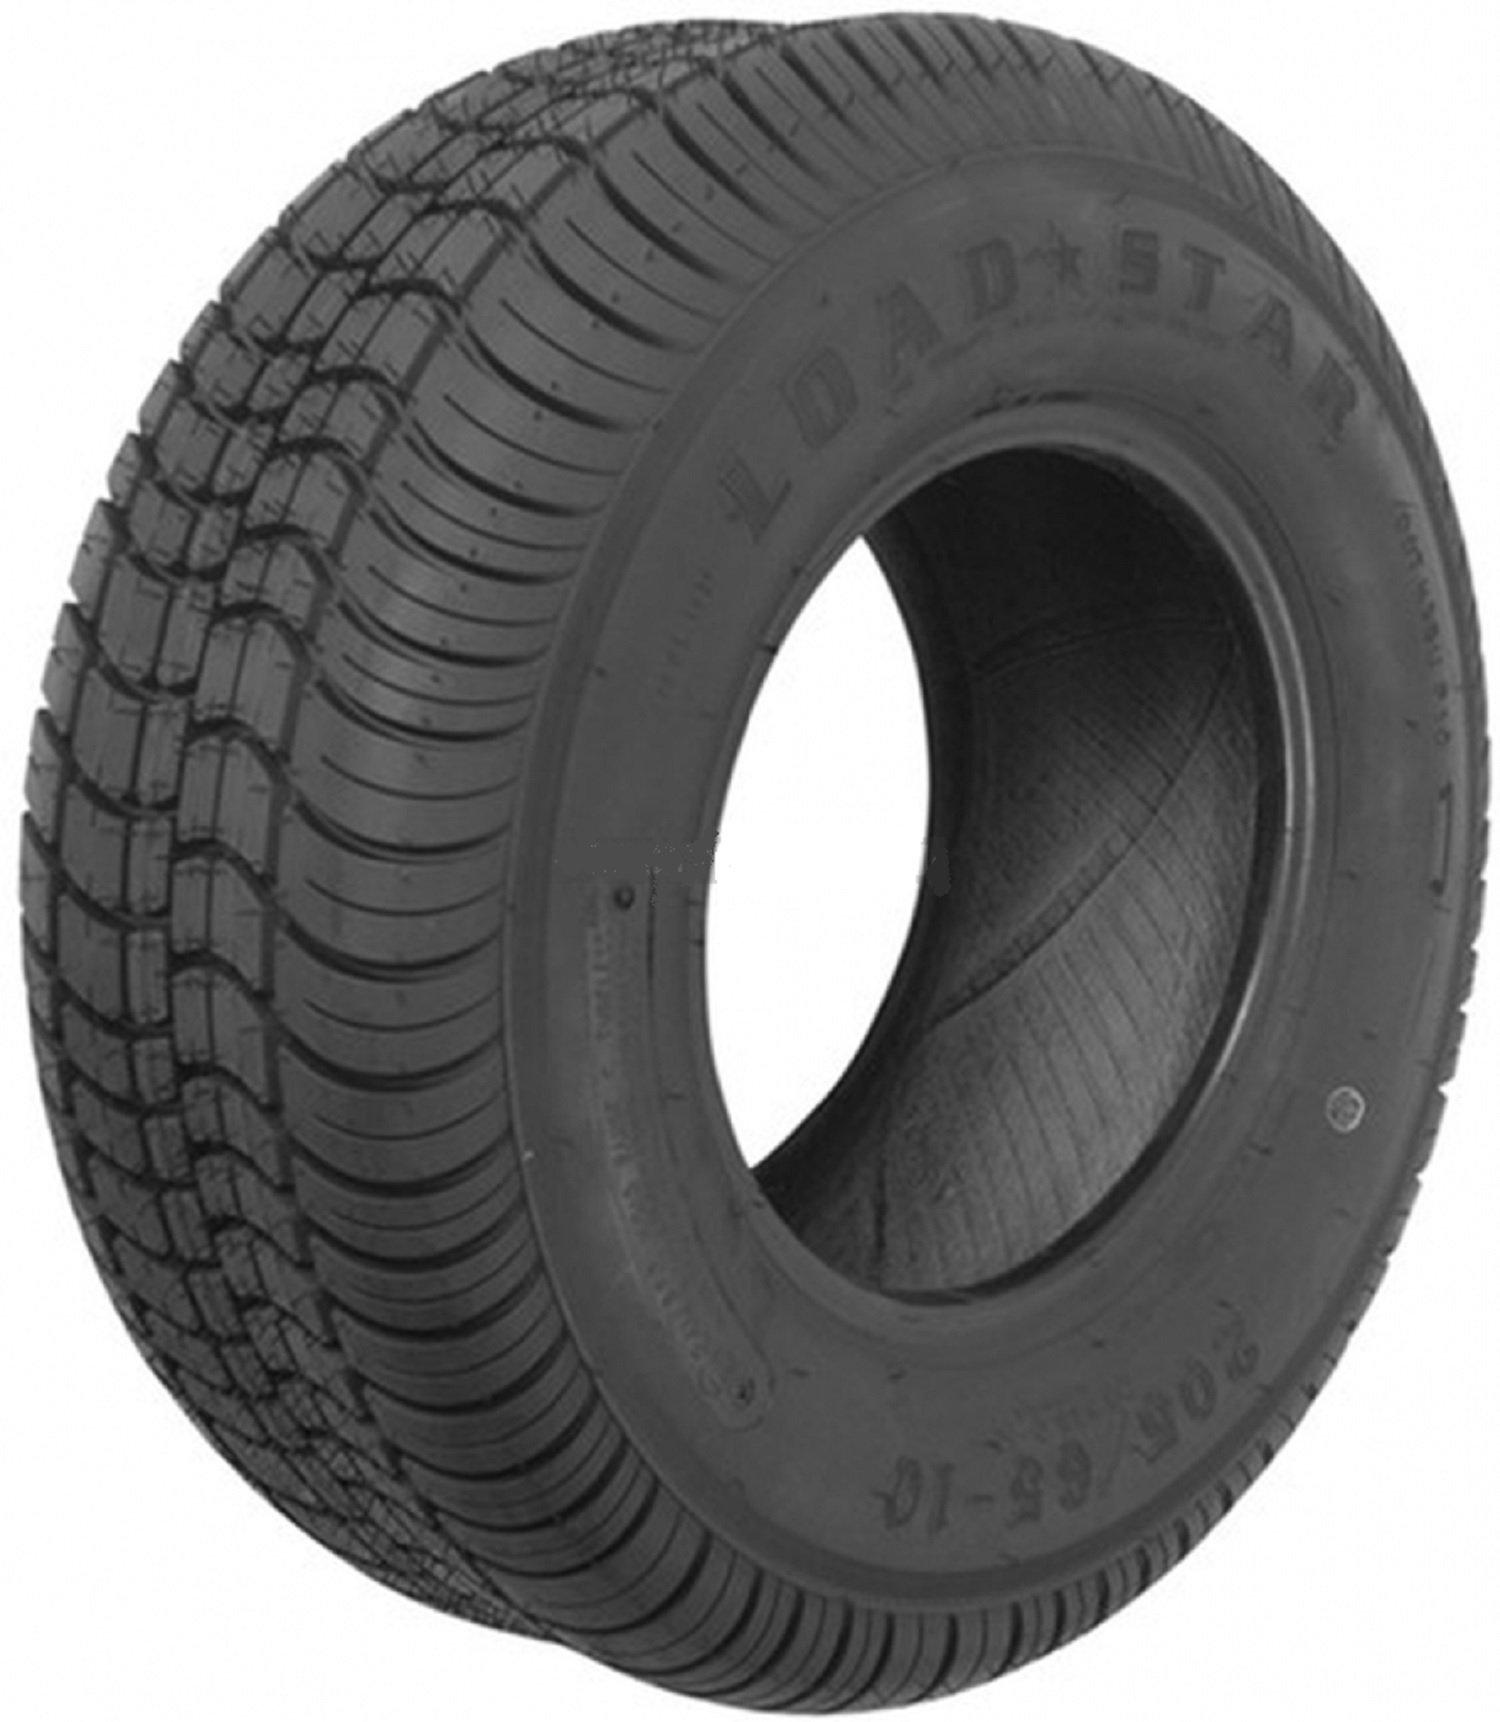 Americana 1HP52 Loadstar K399 205/65-10 Bias Trailer Tire